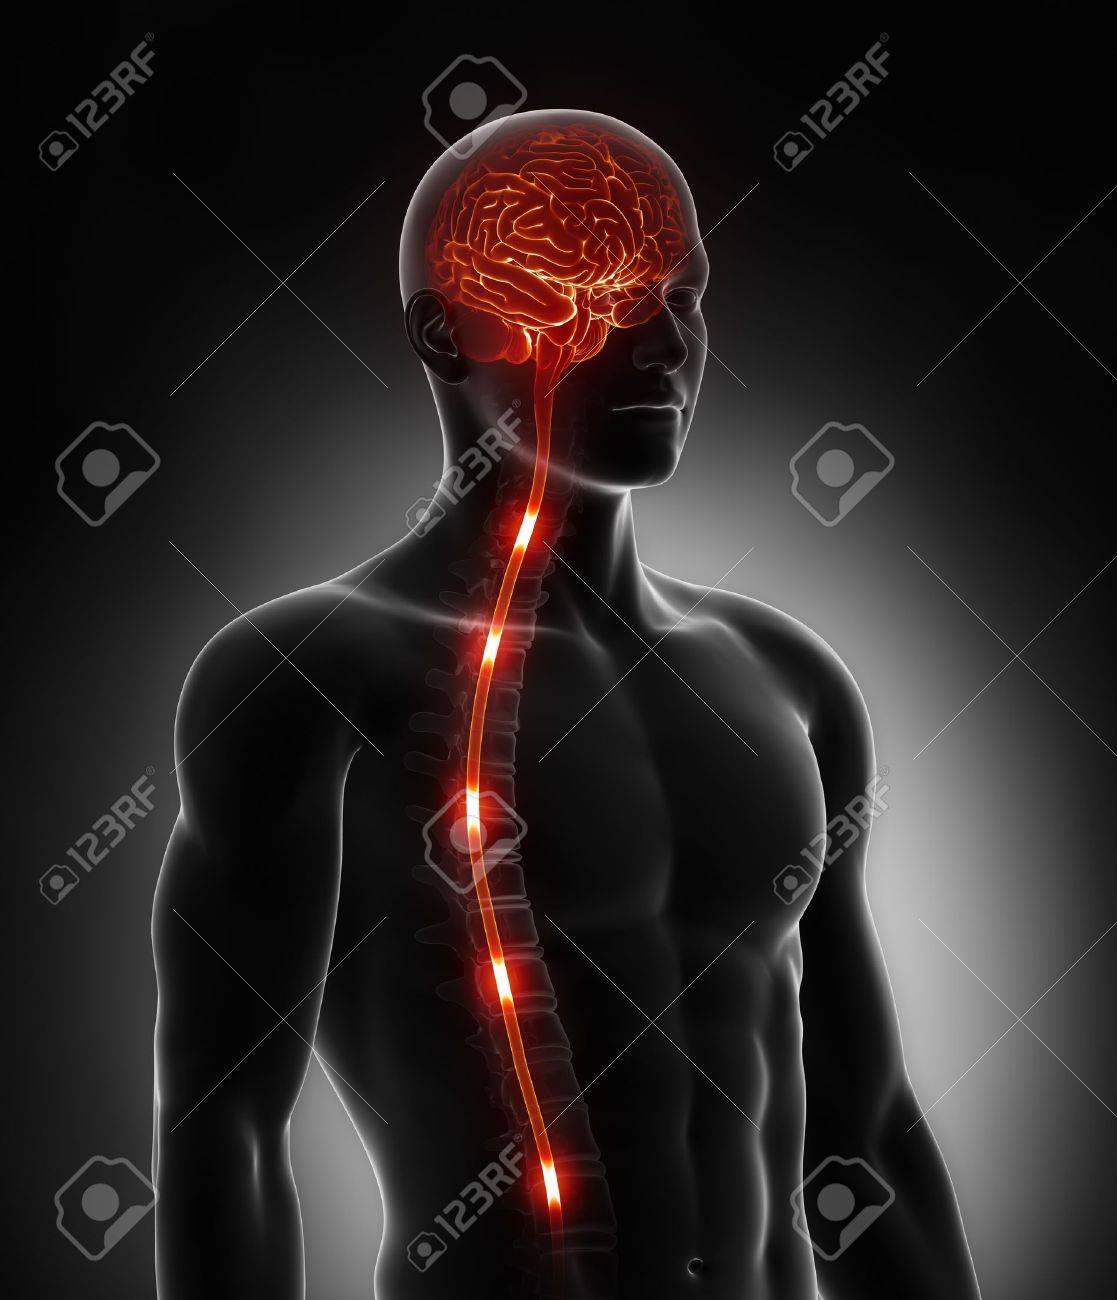 Rückenmark Nerven Energie Impulse In Gehirn Lizenzfreie Fotos ...